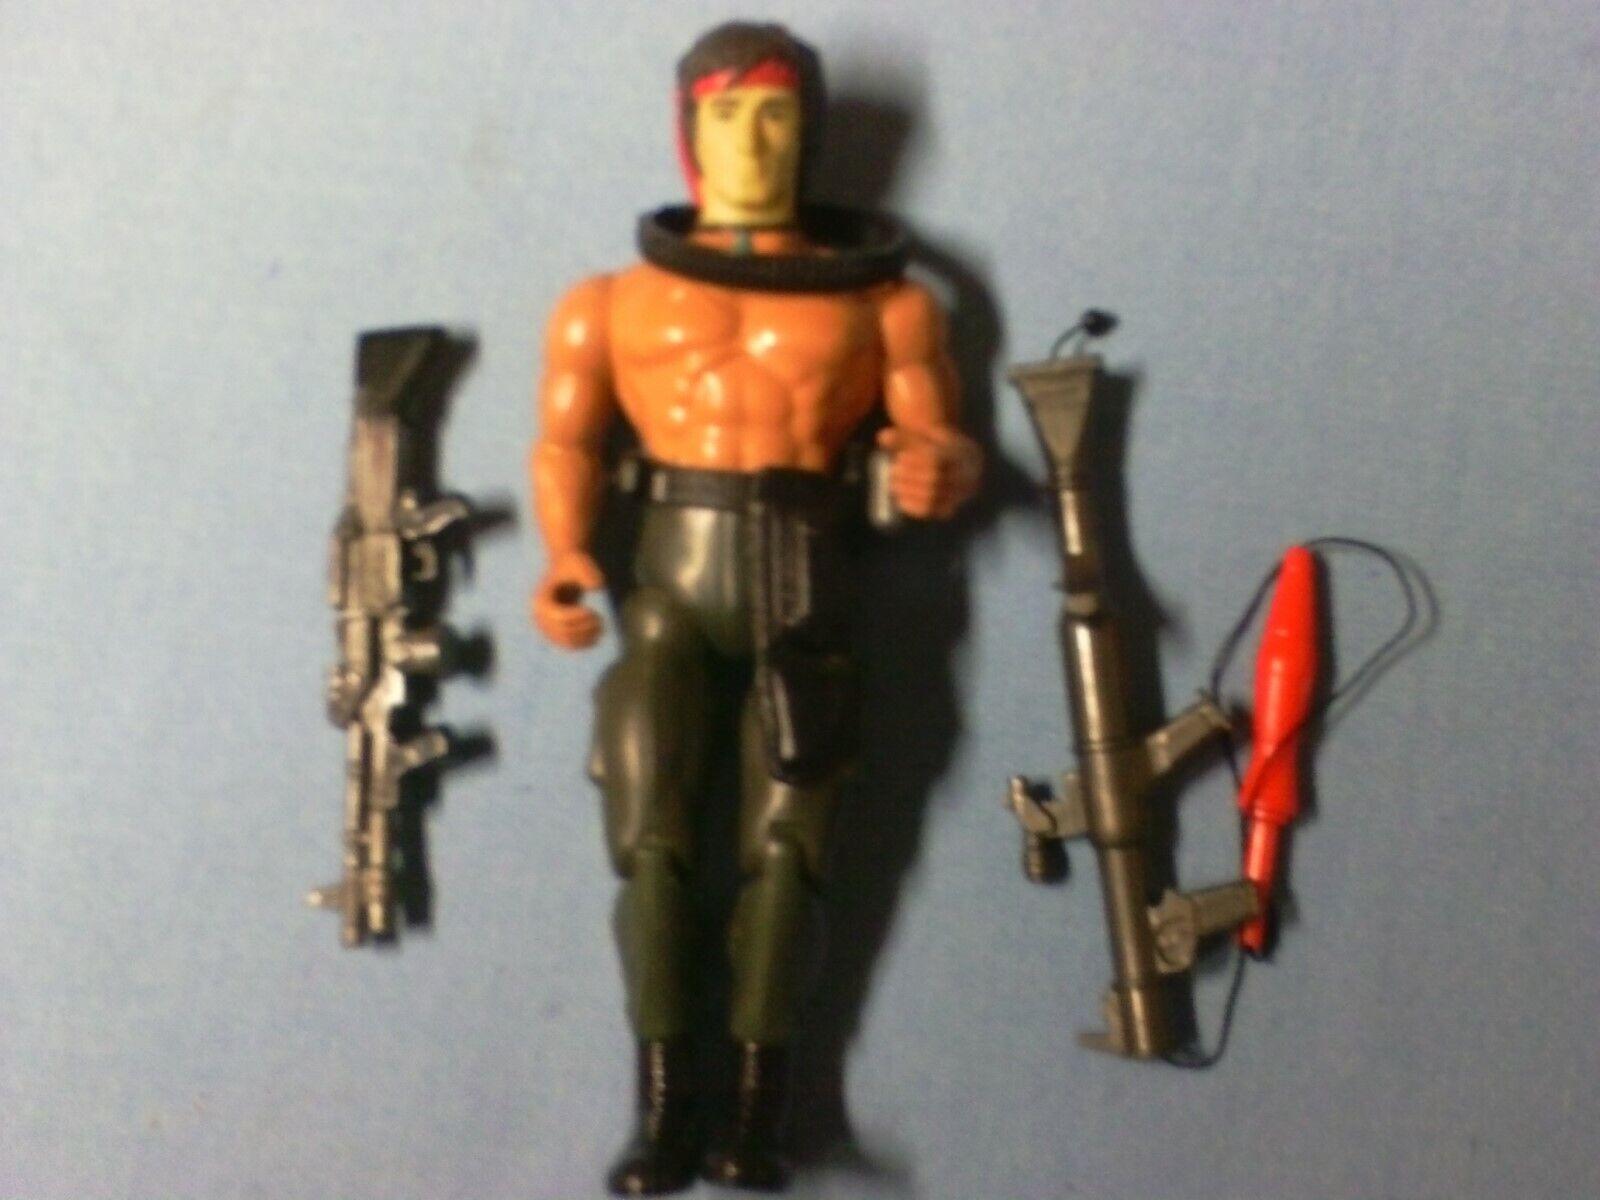 1986 Anabasis Rambo 7  John Rambo Action Figure  LOOSE